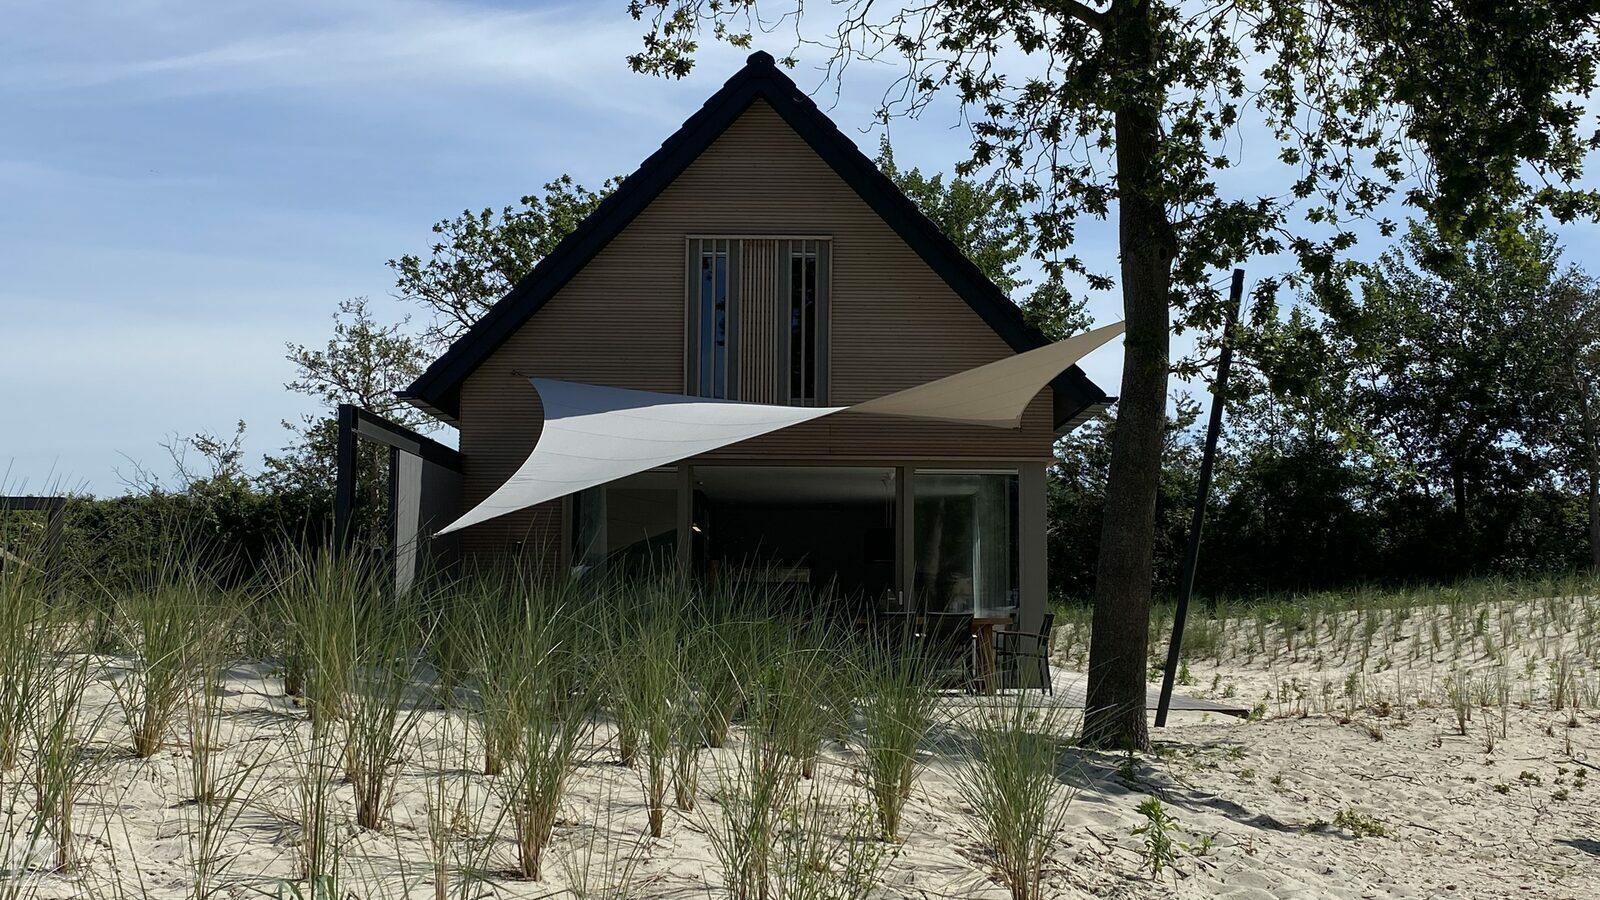 VZ844 Vakantiehuis Ouddorp